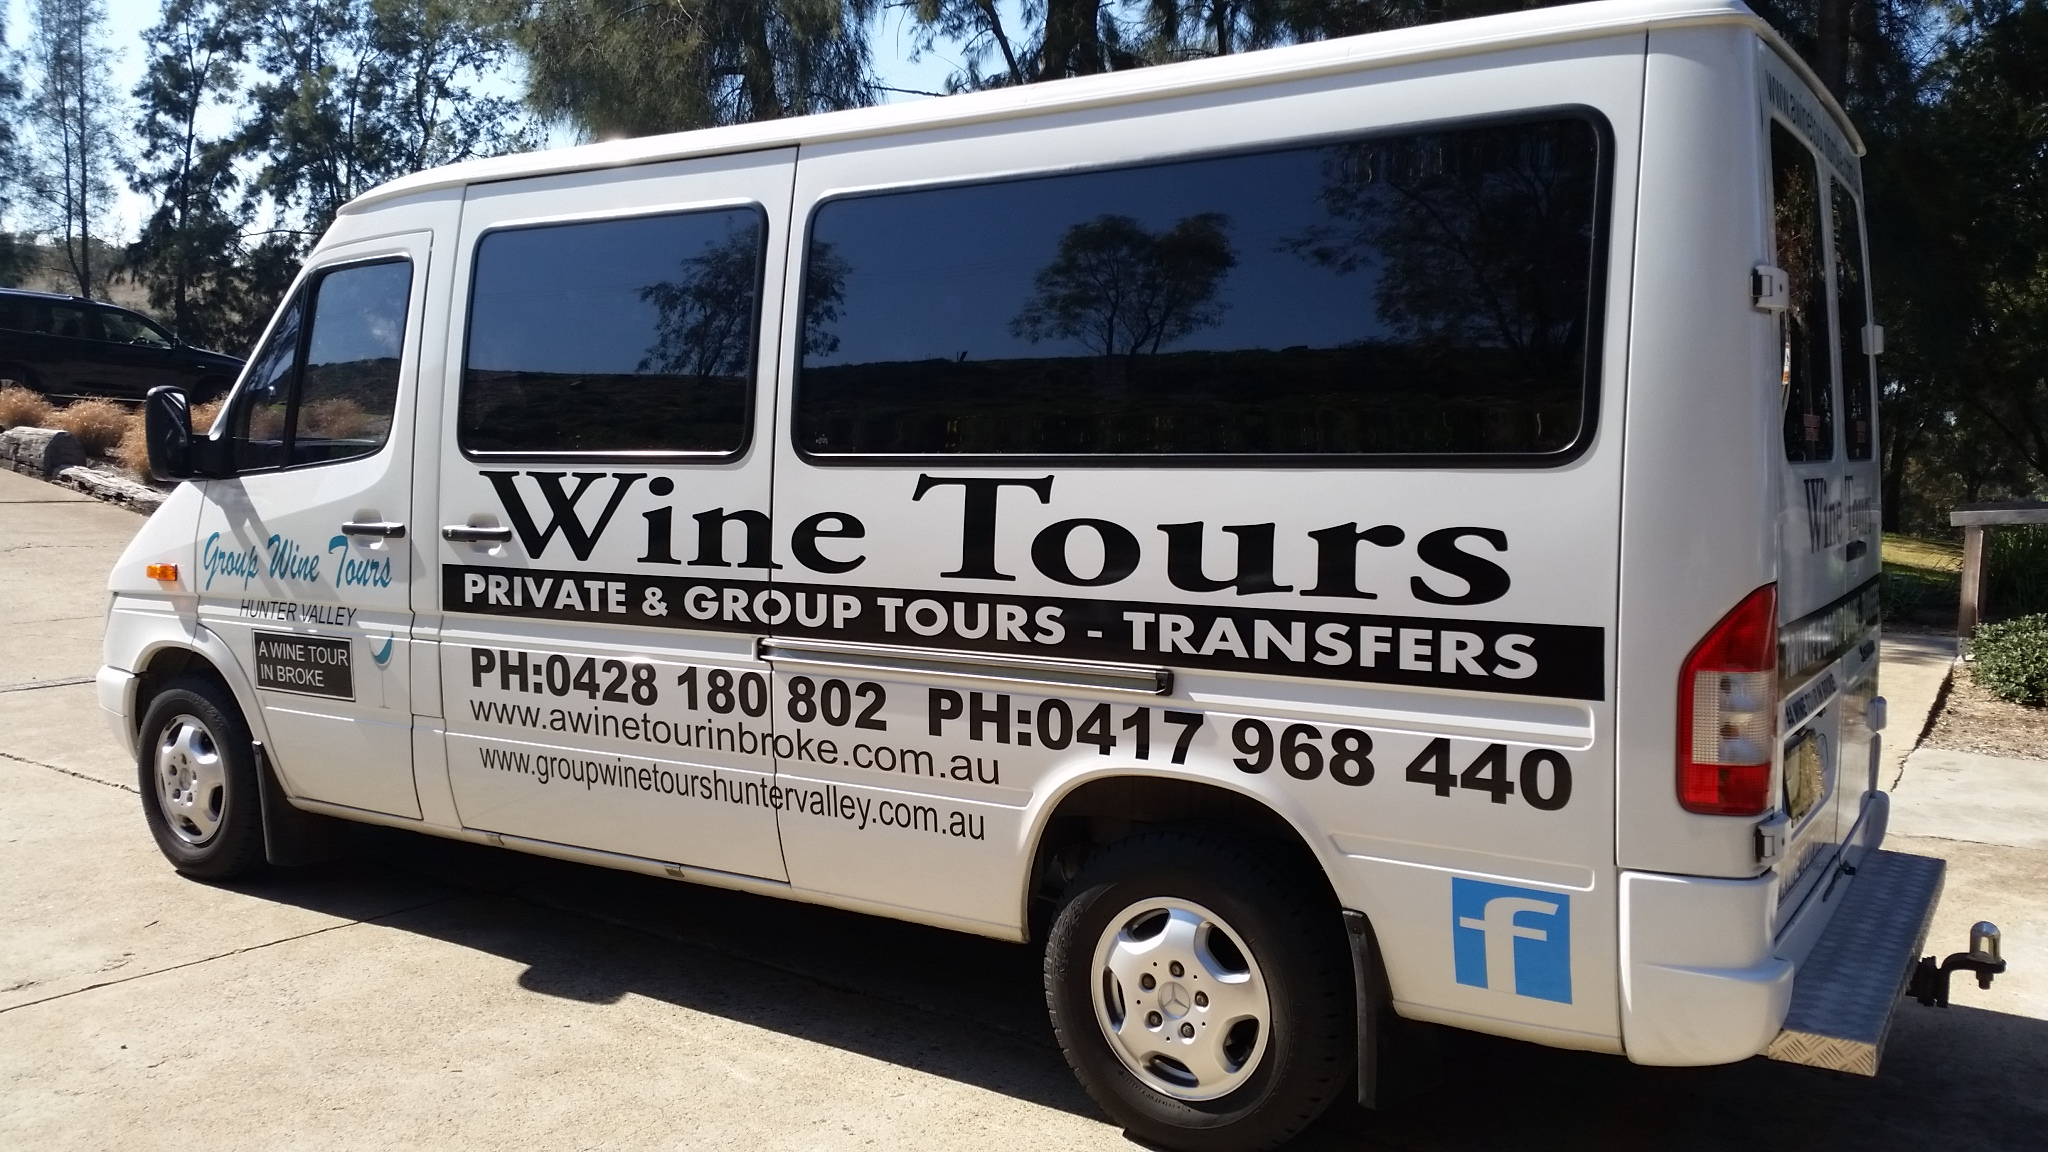 Tour Bus Side on.jpg